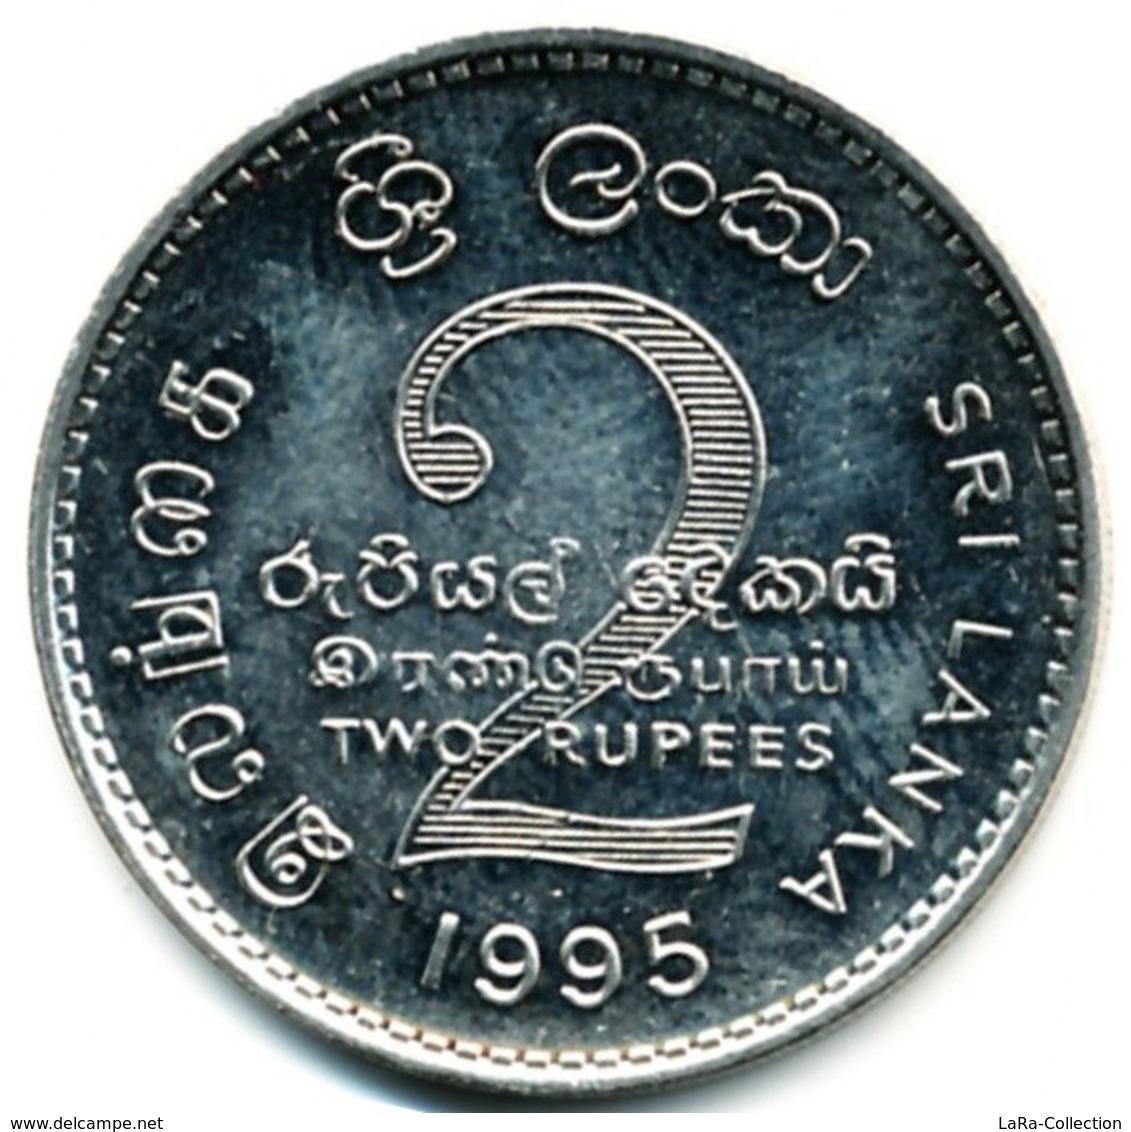 1995 Sri Lanka 2 Rupees (50th Anniversary Of Food And Agriculture Organiz.) Copper - Nickel Coin [#0046] - Sri Lanka